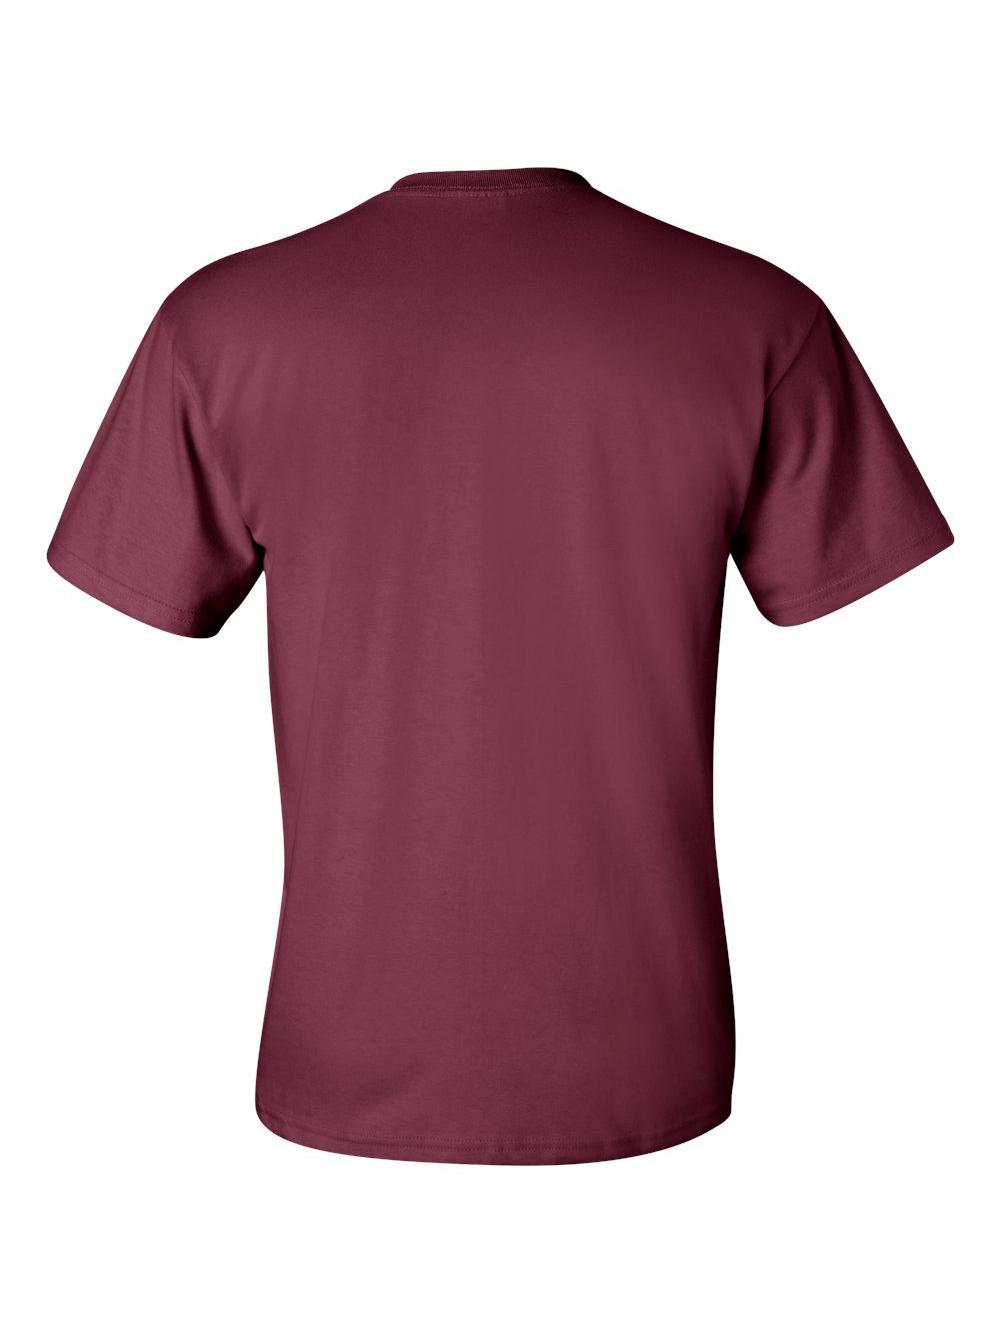 Gildan-Ultra-Cotton-T-Shirt-with-a-Pocket-2300 thumbnail 19